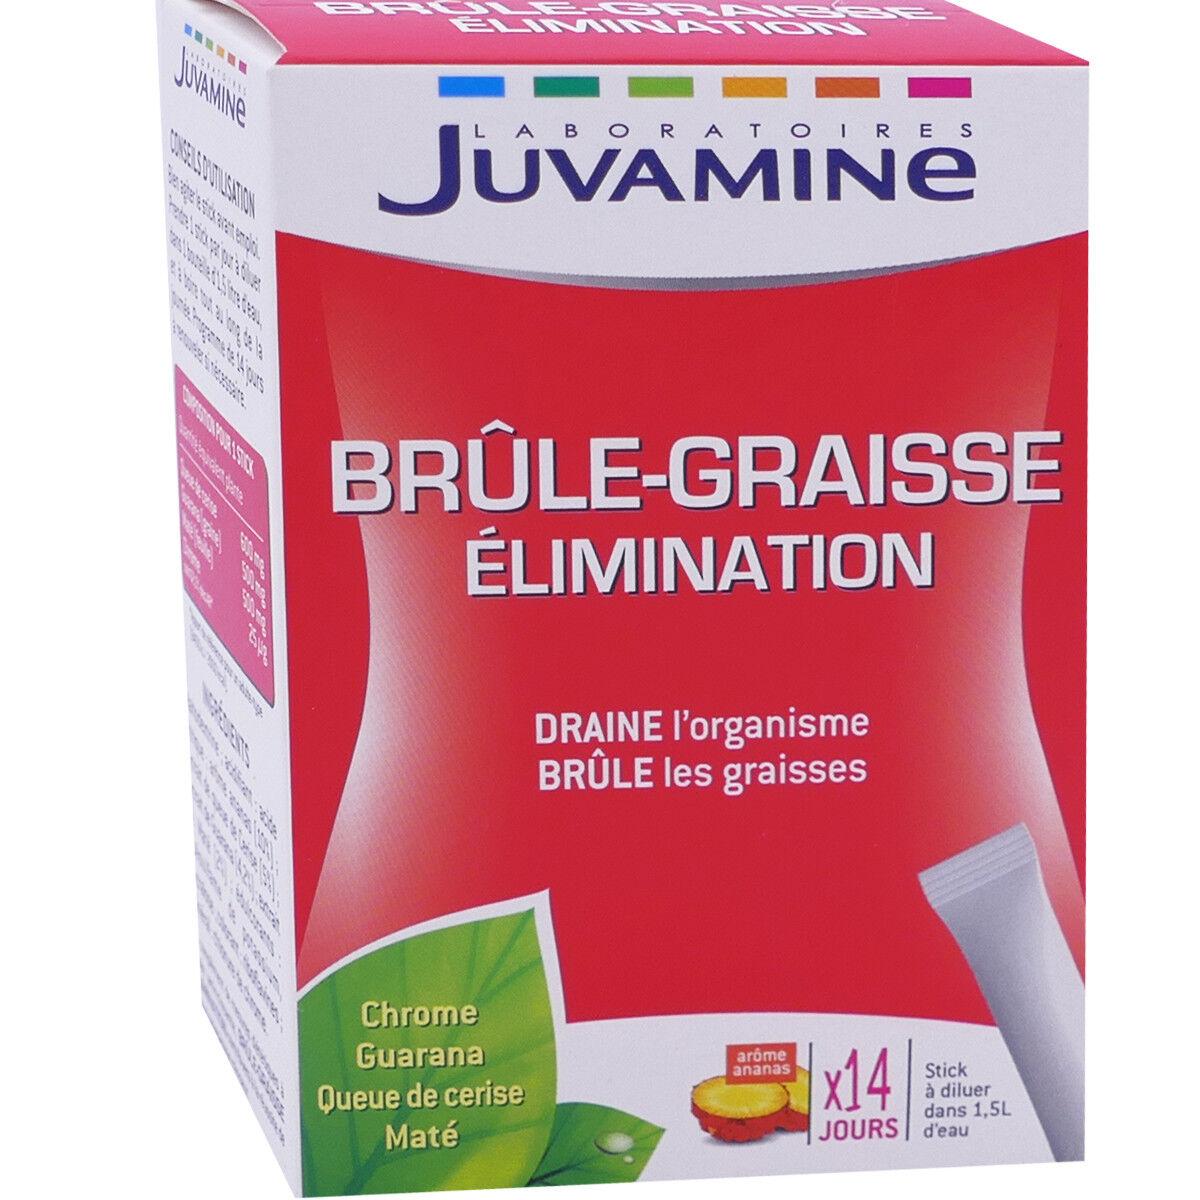 JUVASANTE Juvamine brule graisse elimination 14 stick